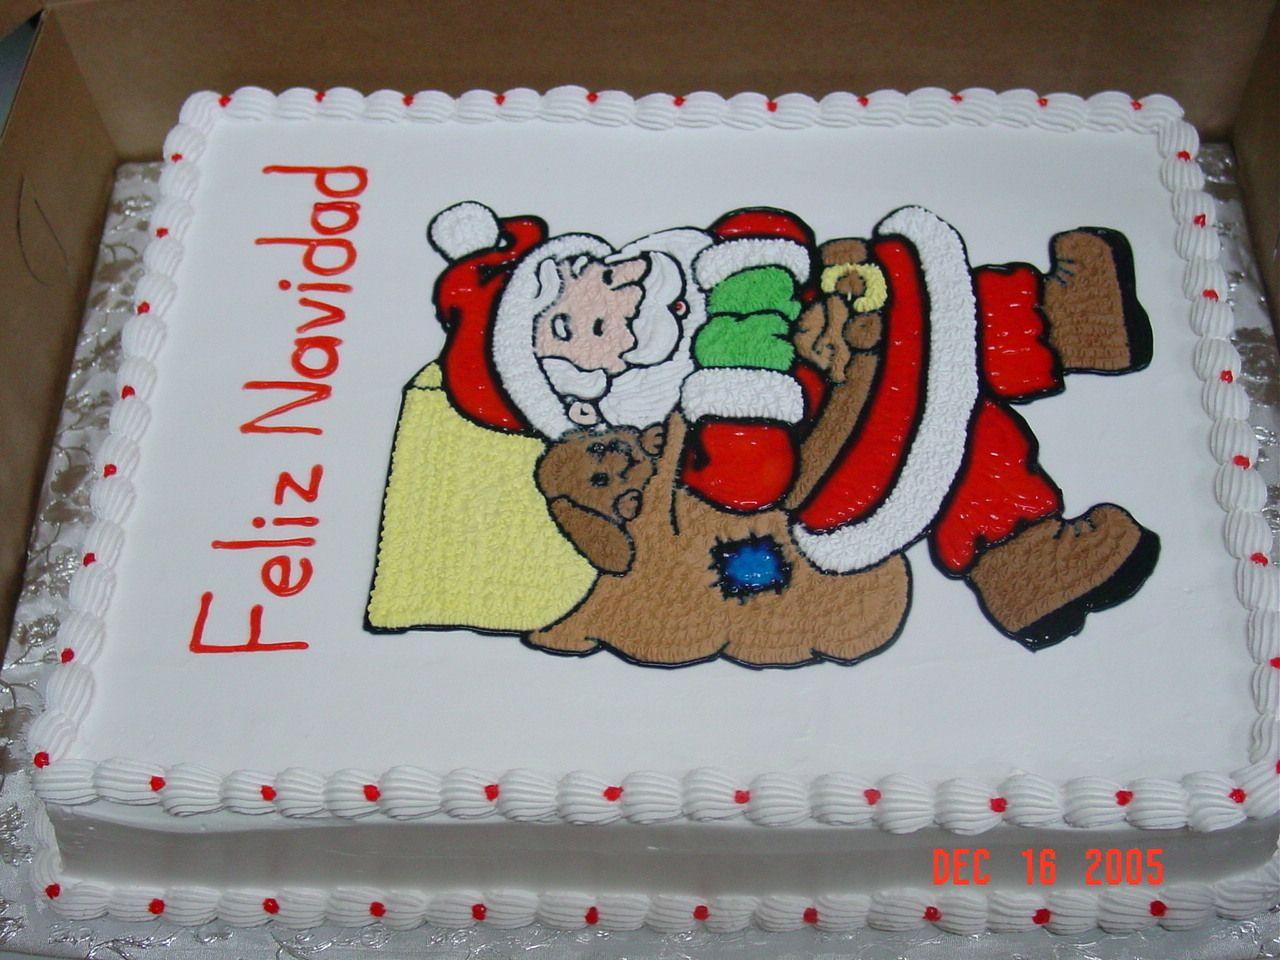 Pastel Navidad Santa Claus Christmas Cake Christmas Food Christmas Desserts